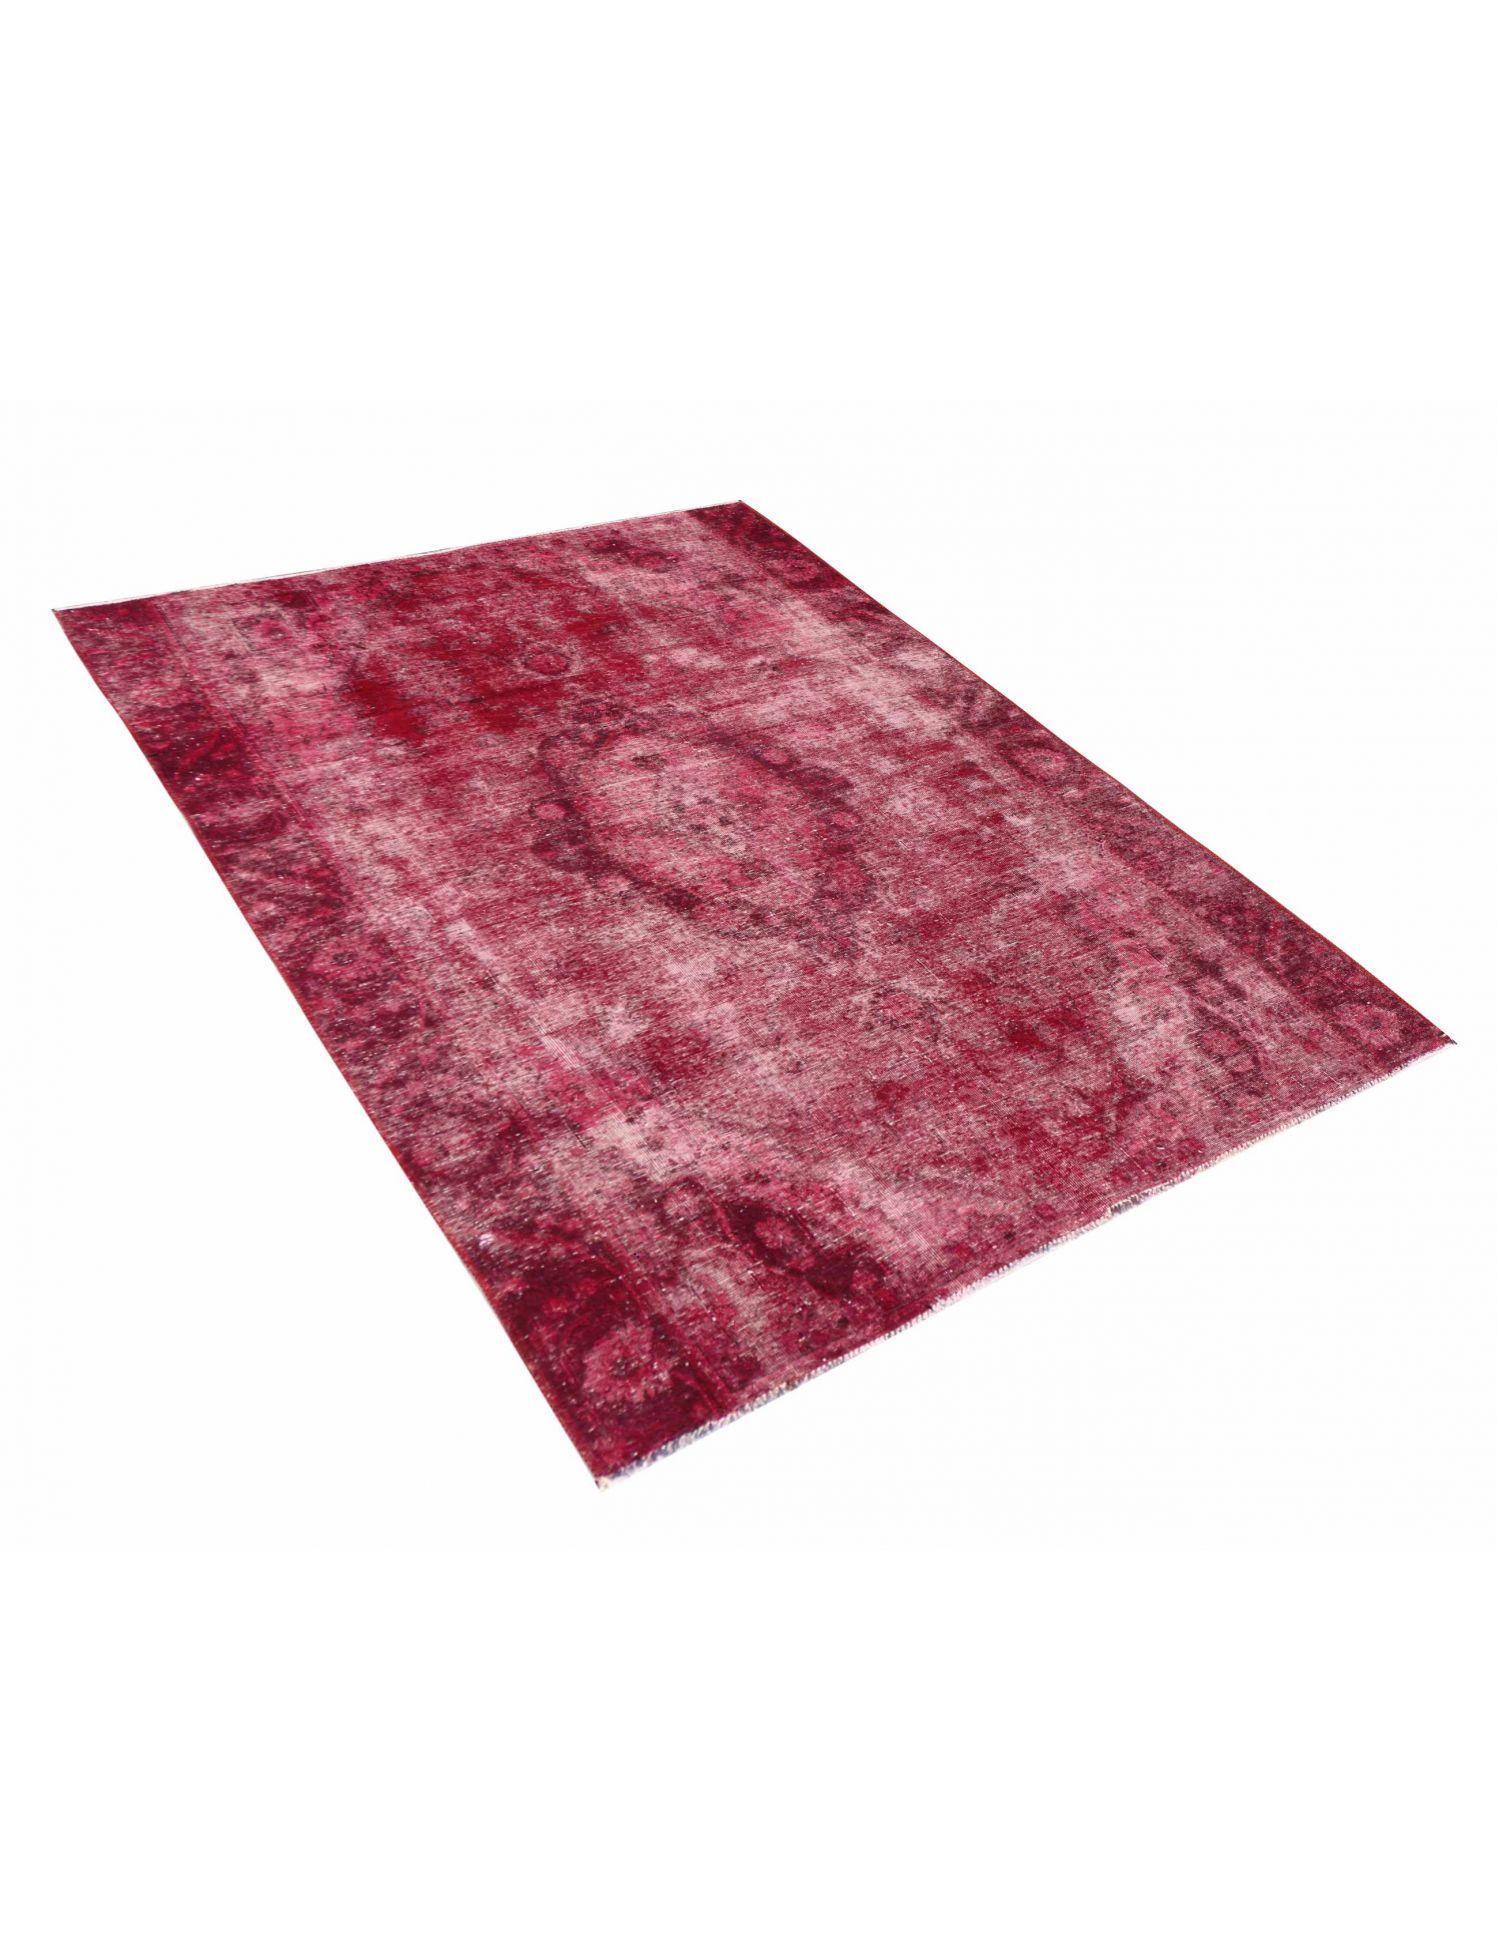 Perzisch Vintage Tapijt  rood <br/>246 x 189 cm